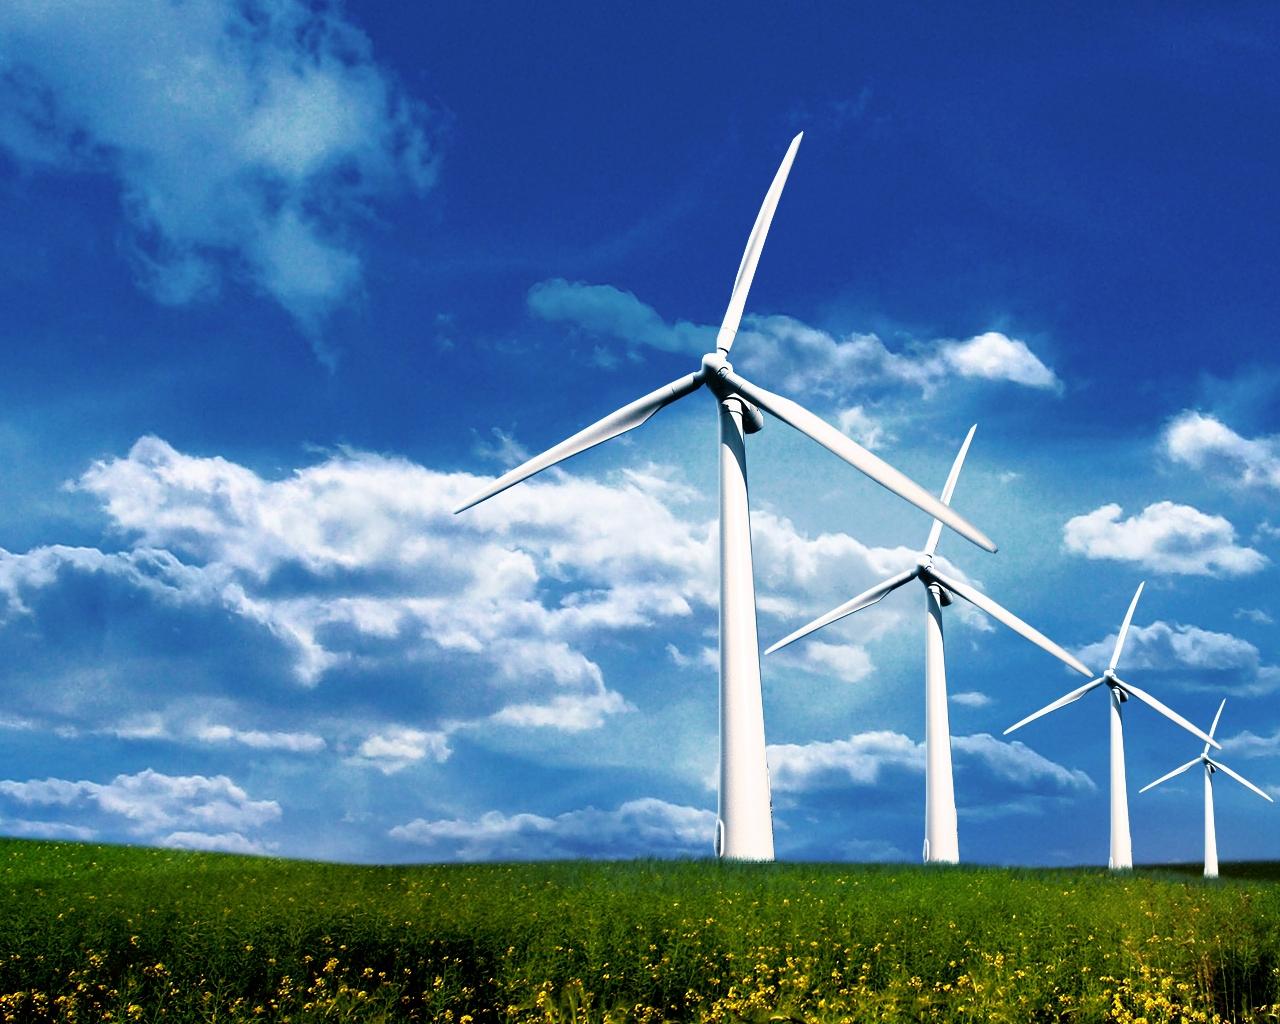 Day 2: Wind Turbine Appeal Hearing